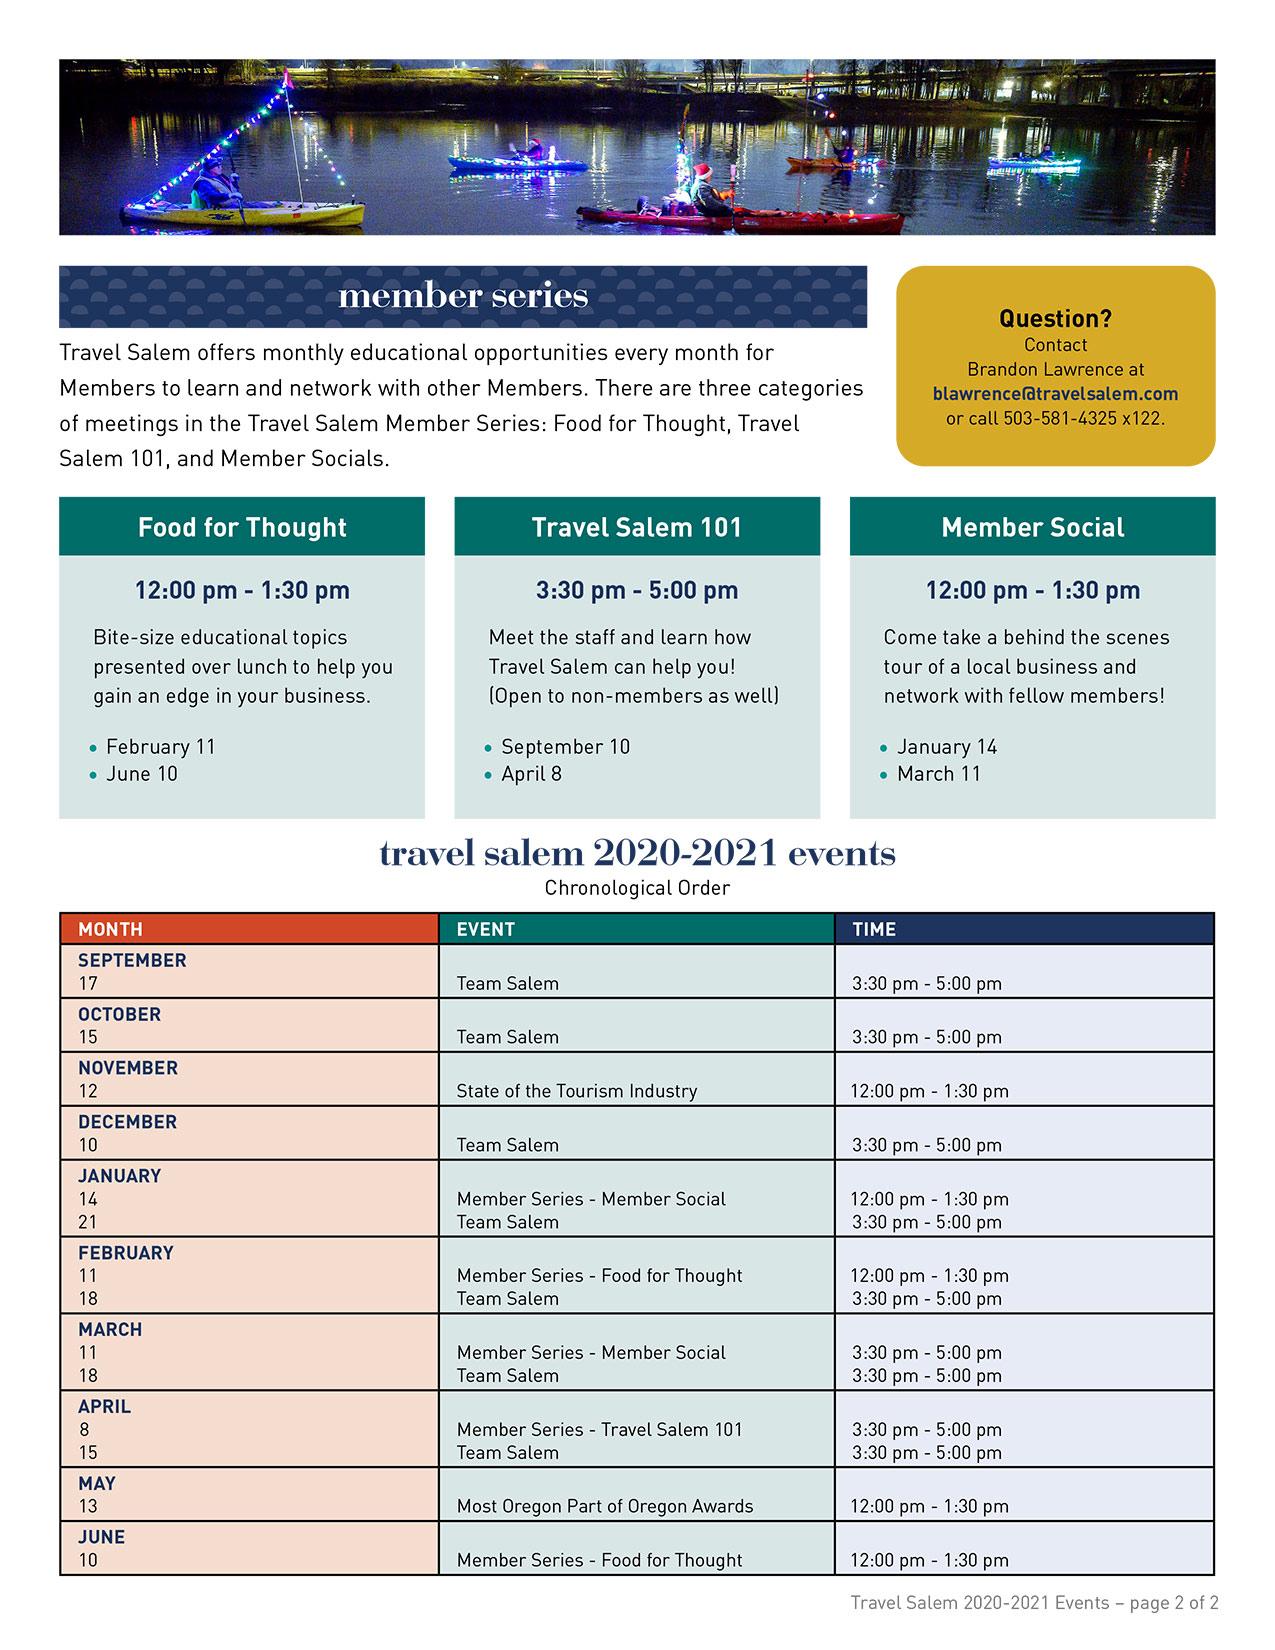 Travel Salem 2020 Save the Date Document